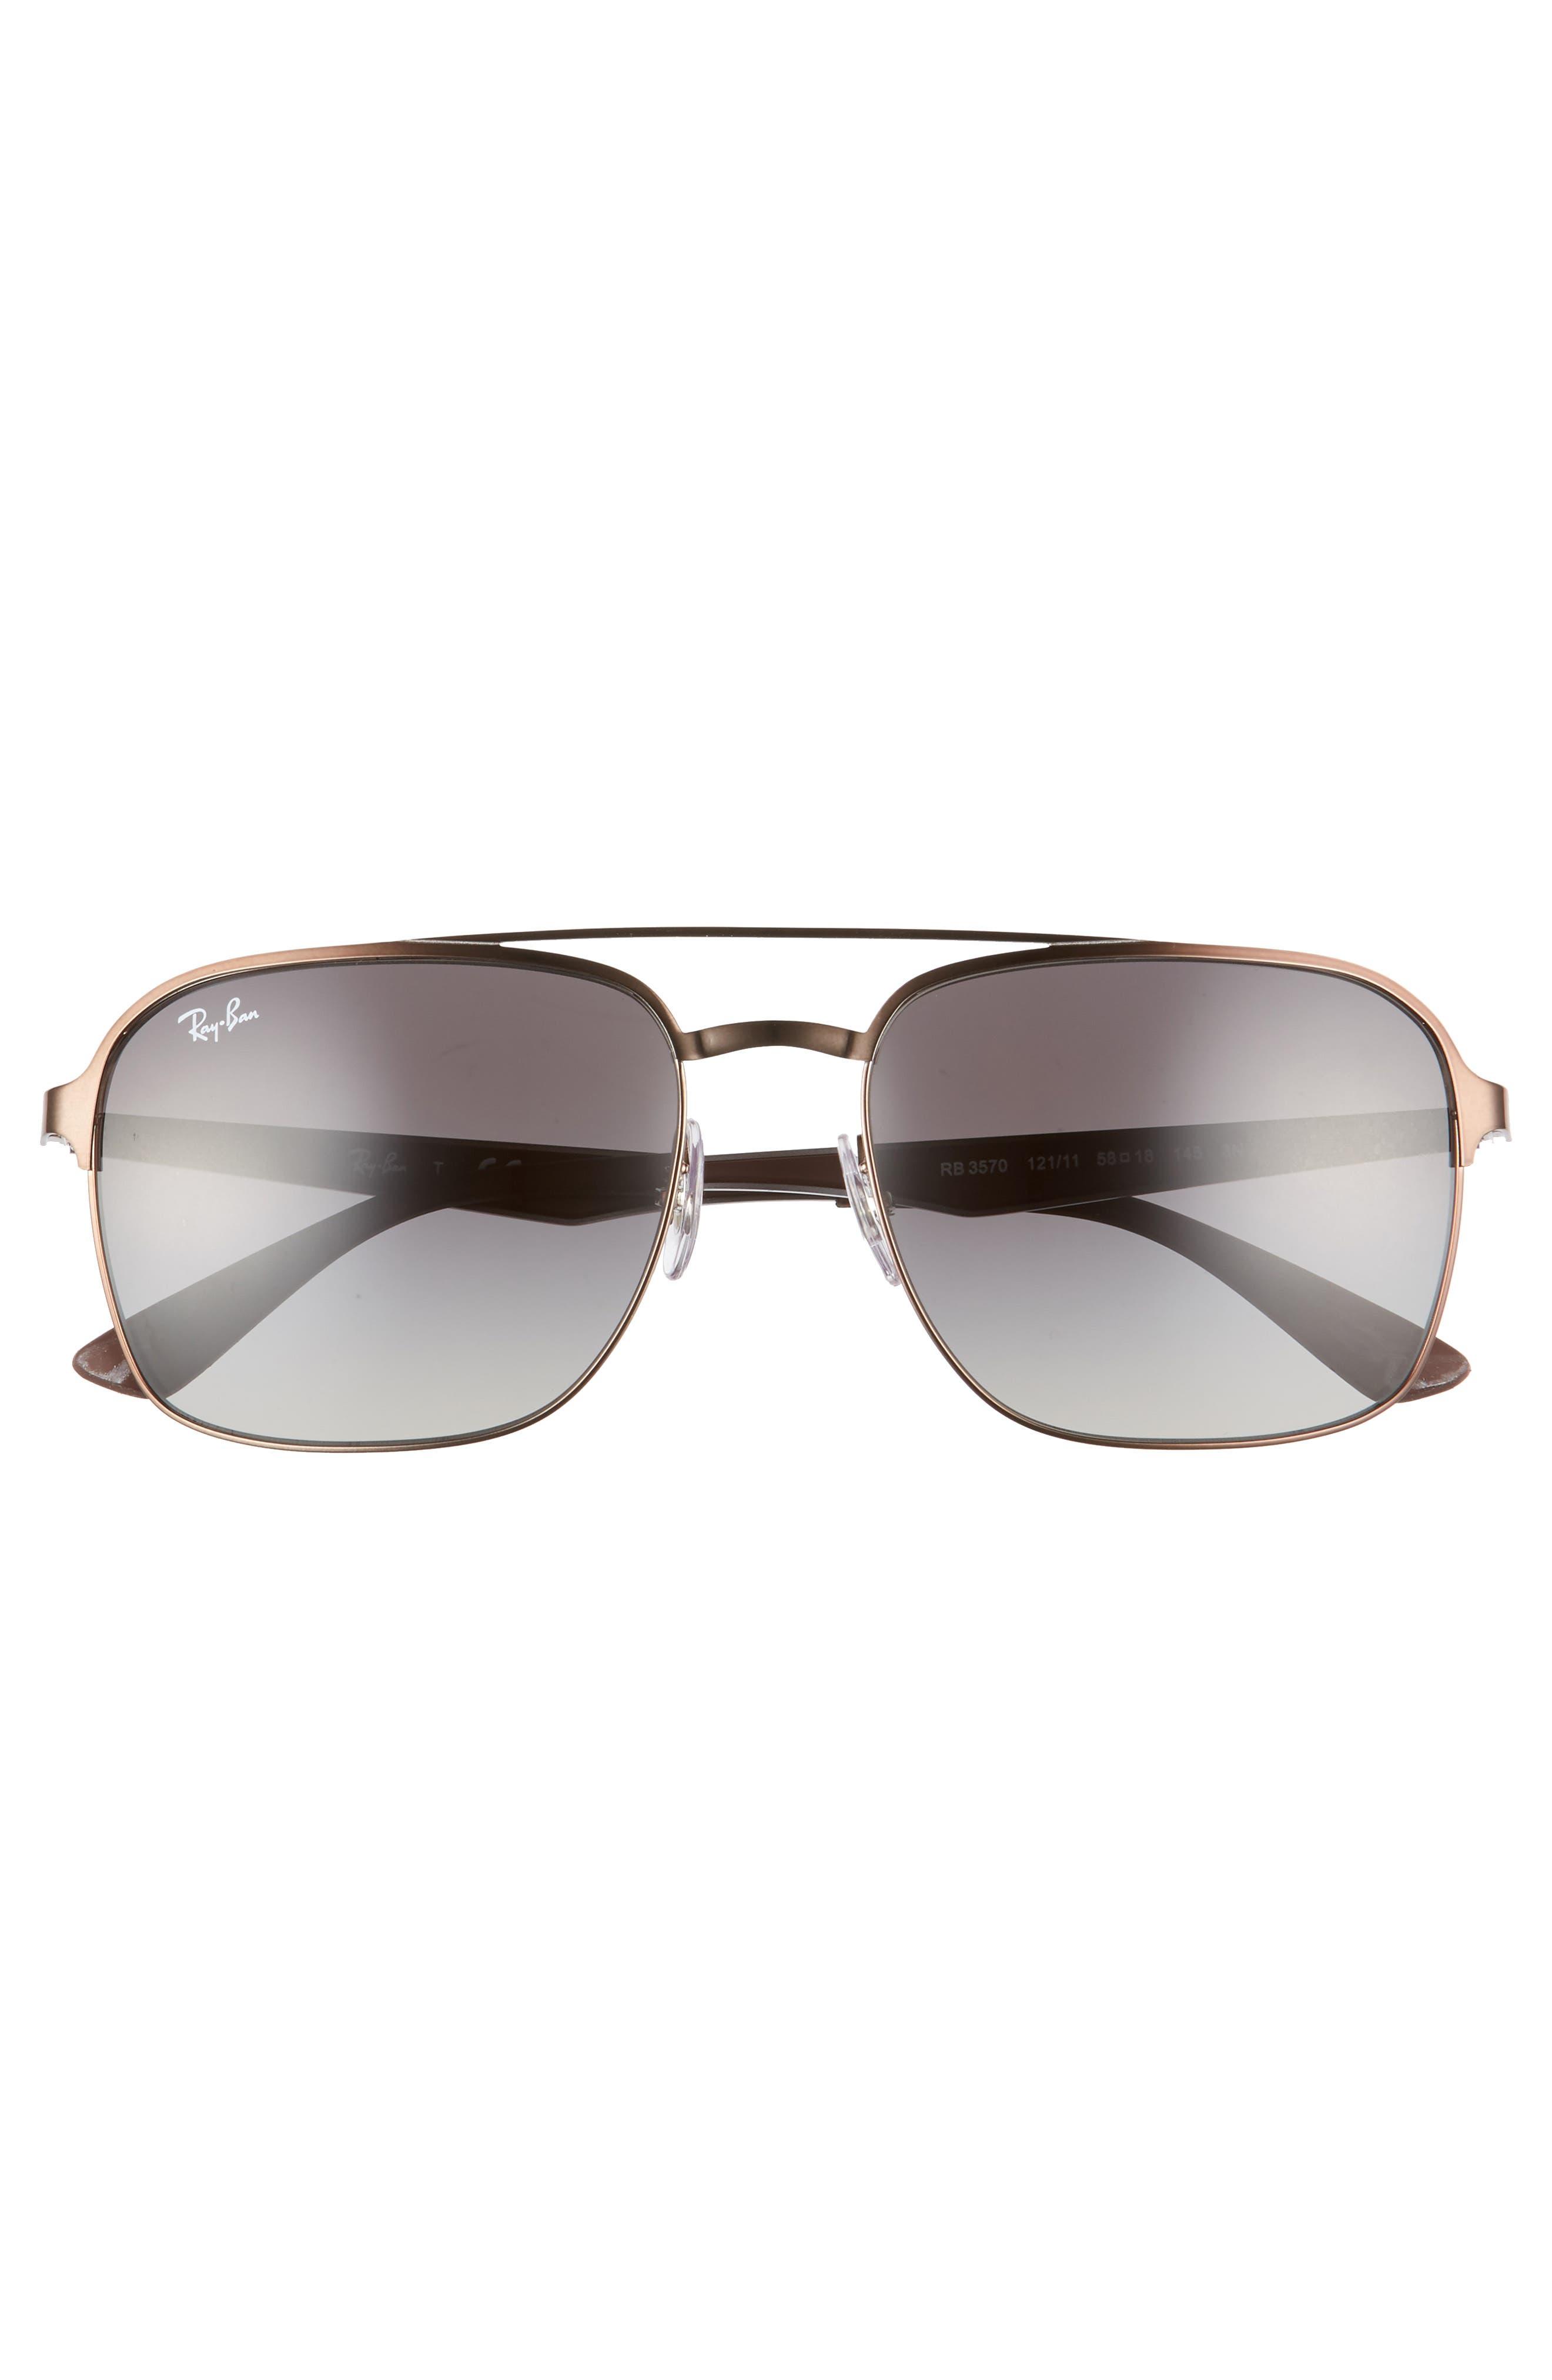 Retro 58mm Sunglasses,                             Alternate thumbnail 2, color,                             Brown